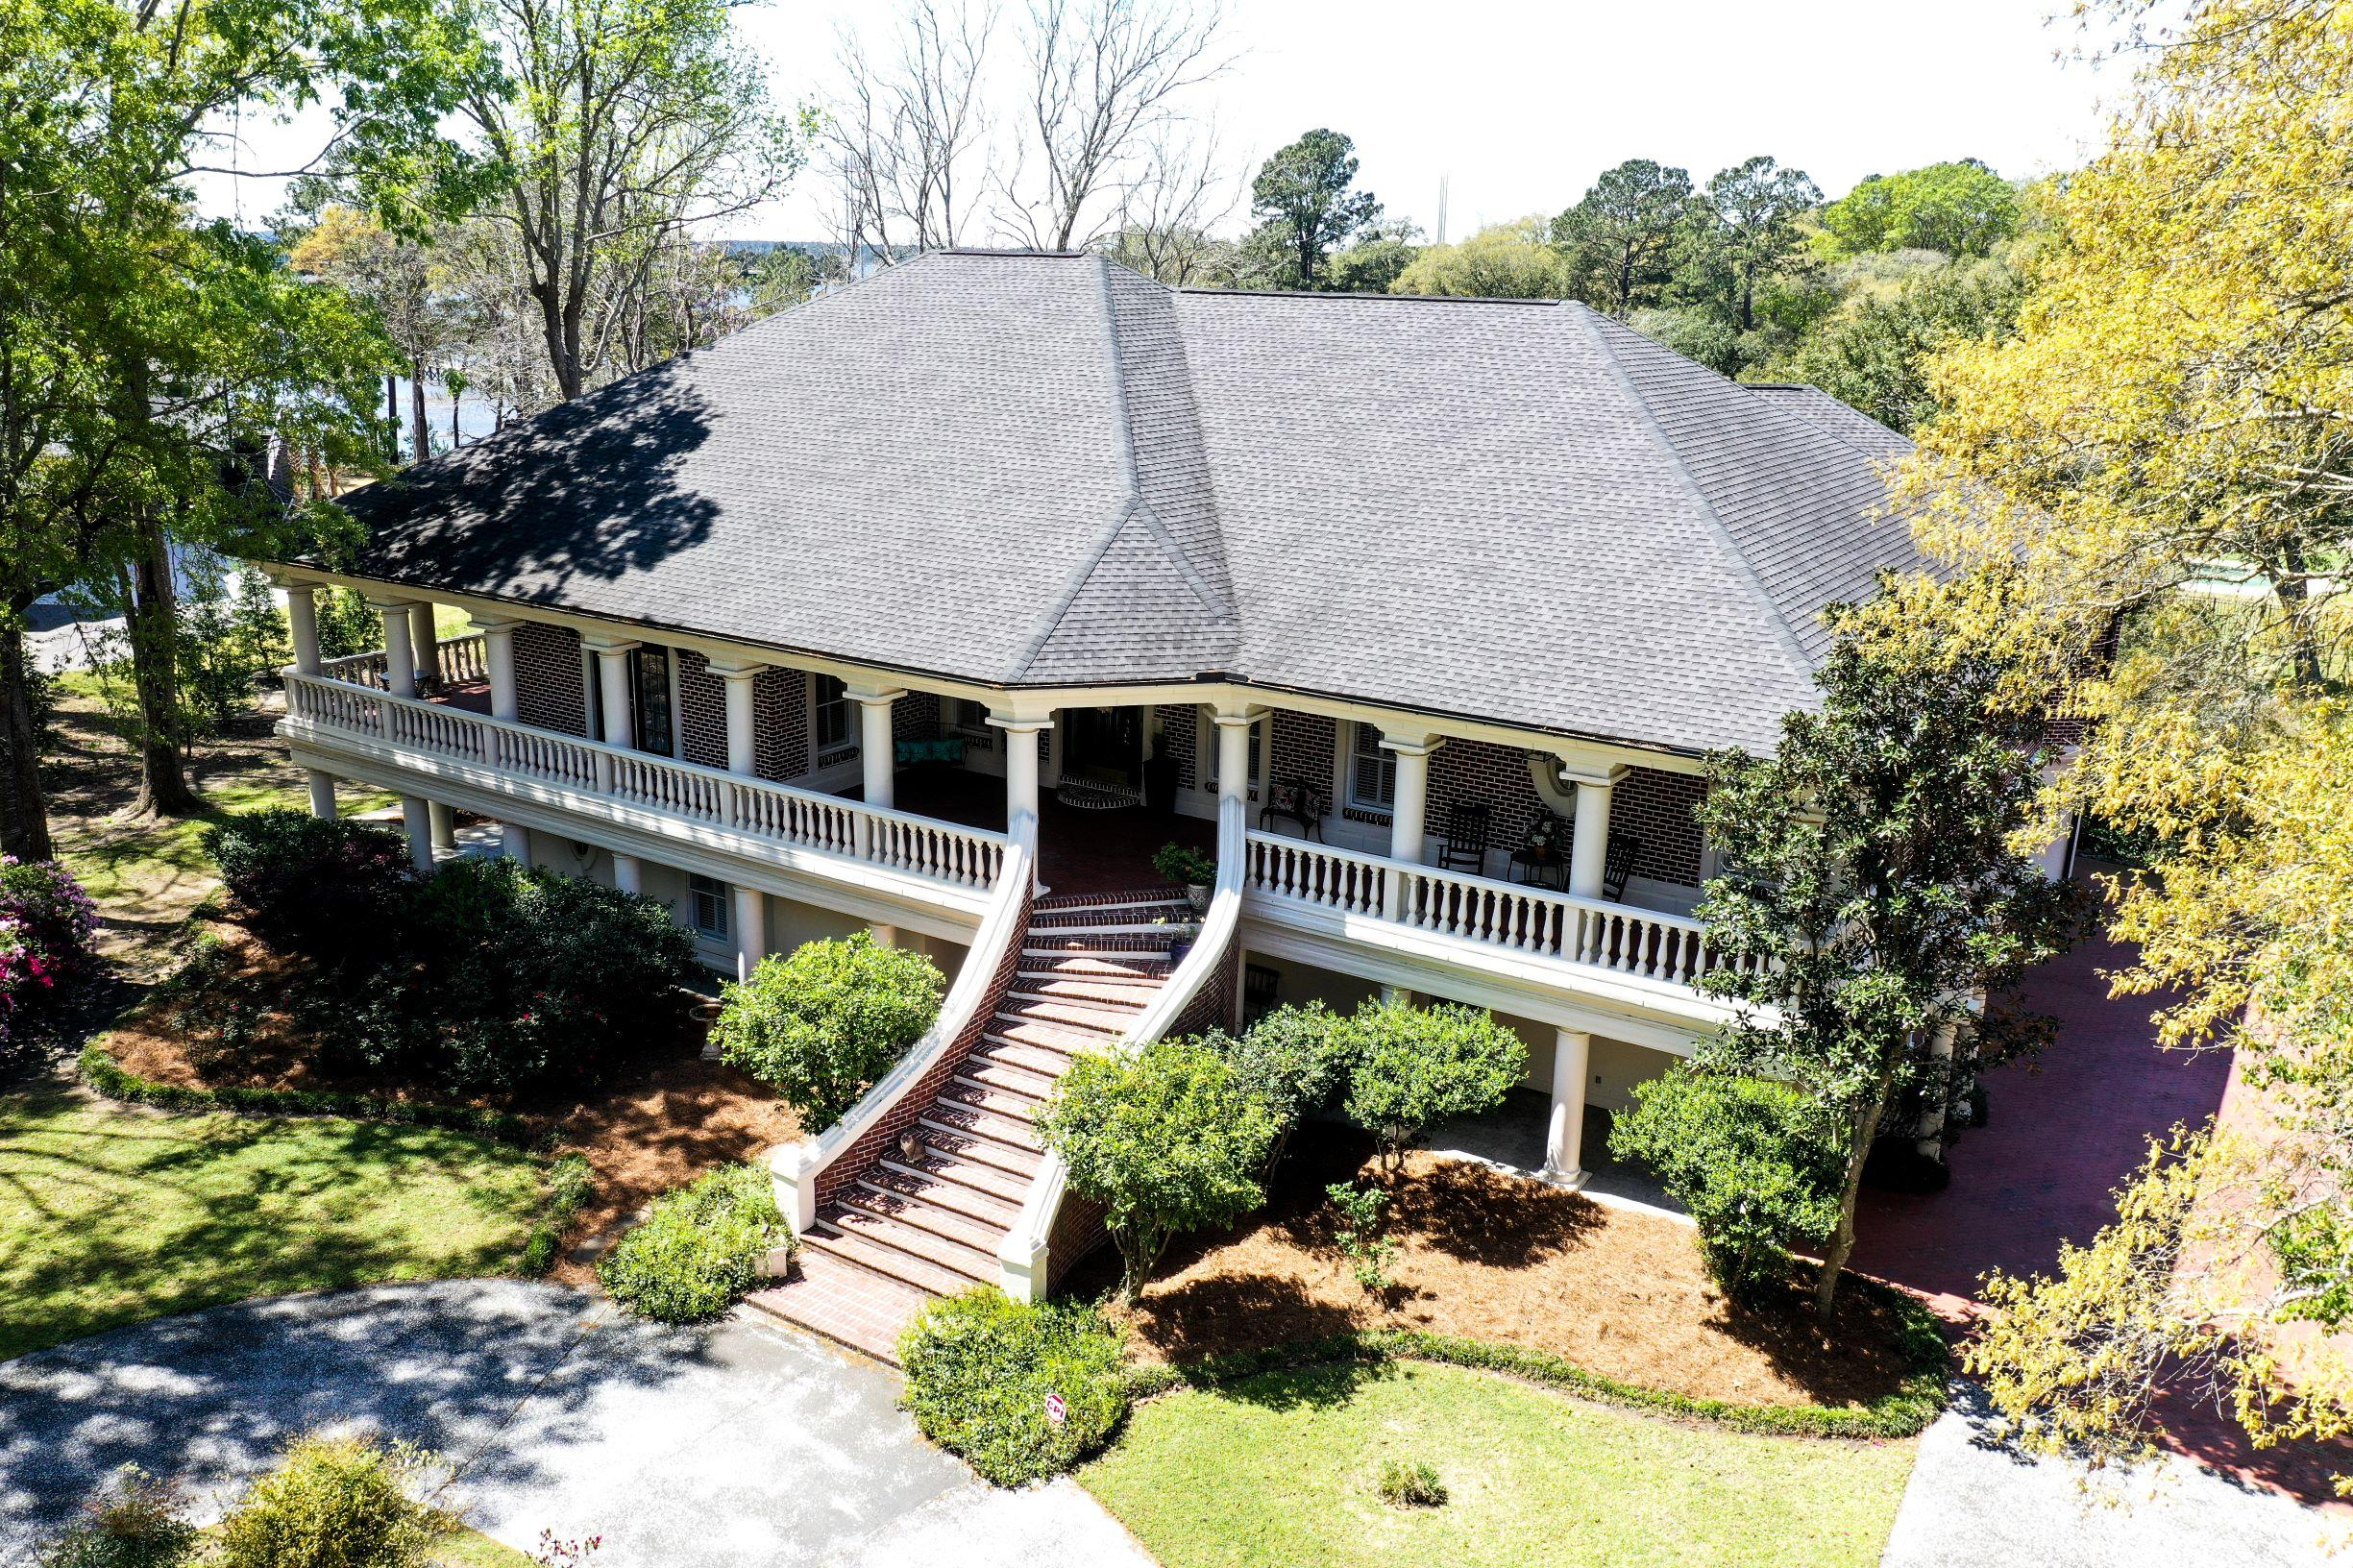 Cainhoy Landing Homes For Sale - 112 Cainhoy Landing, Charleston, SC - 75